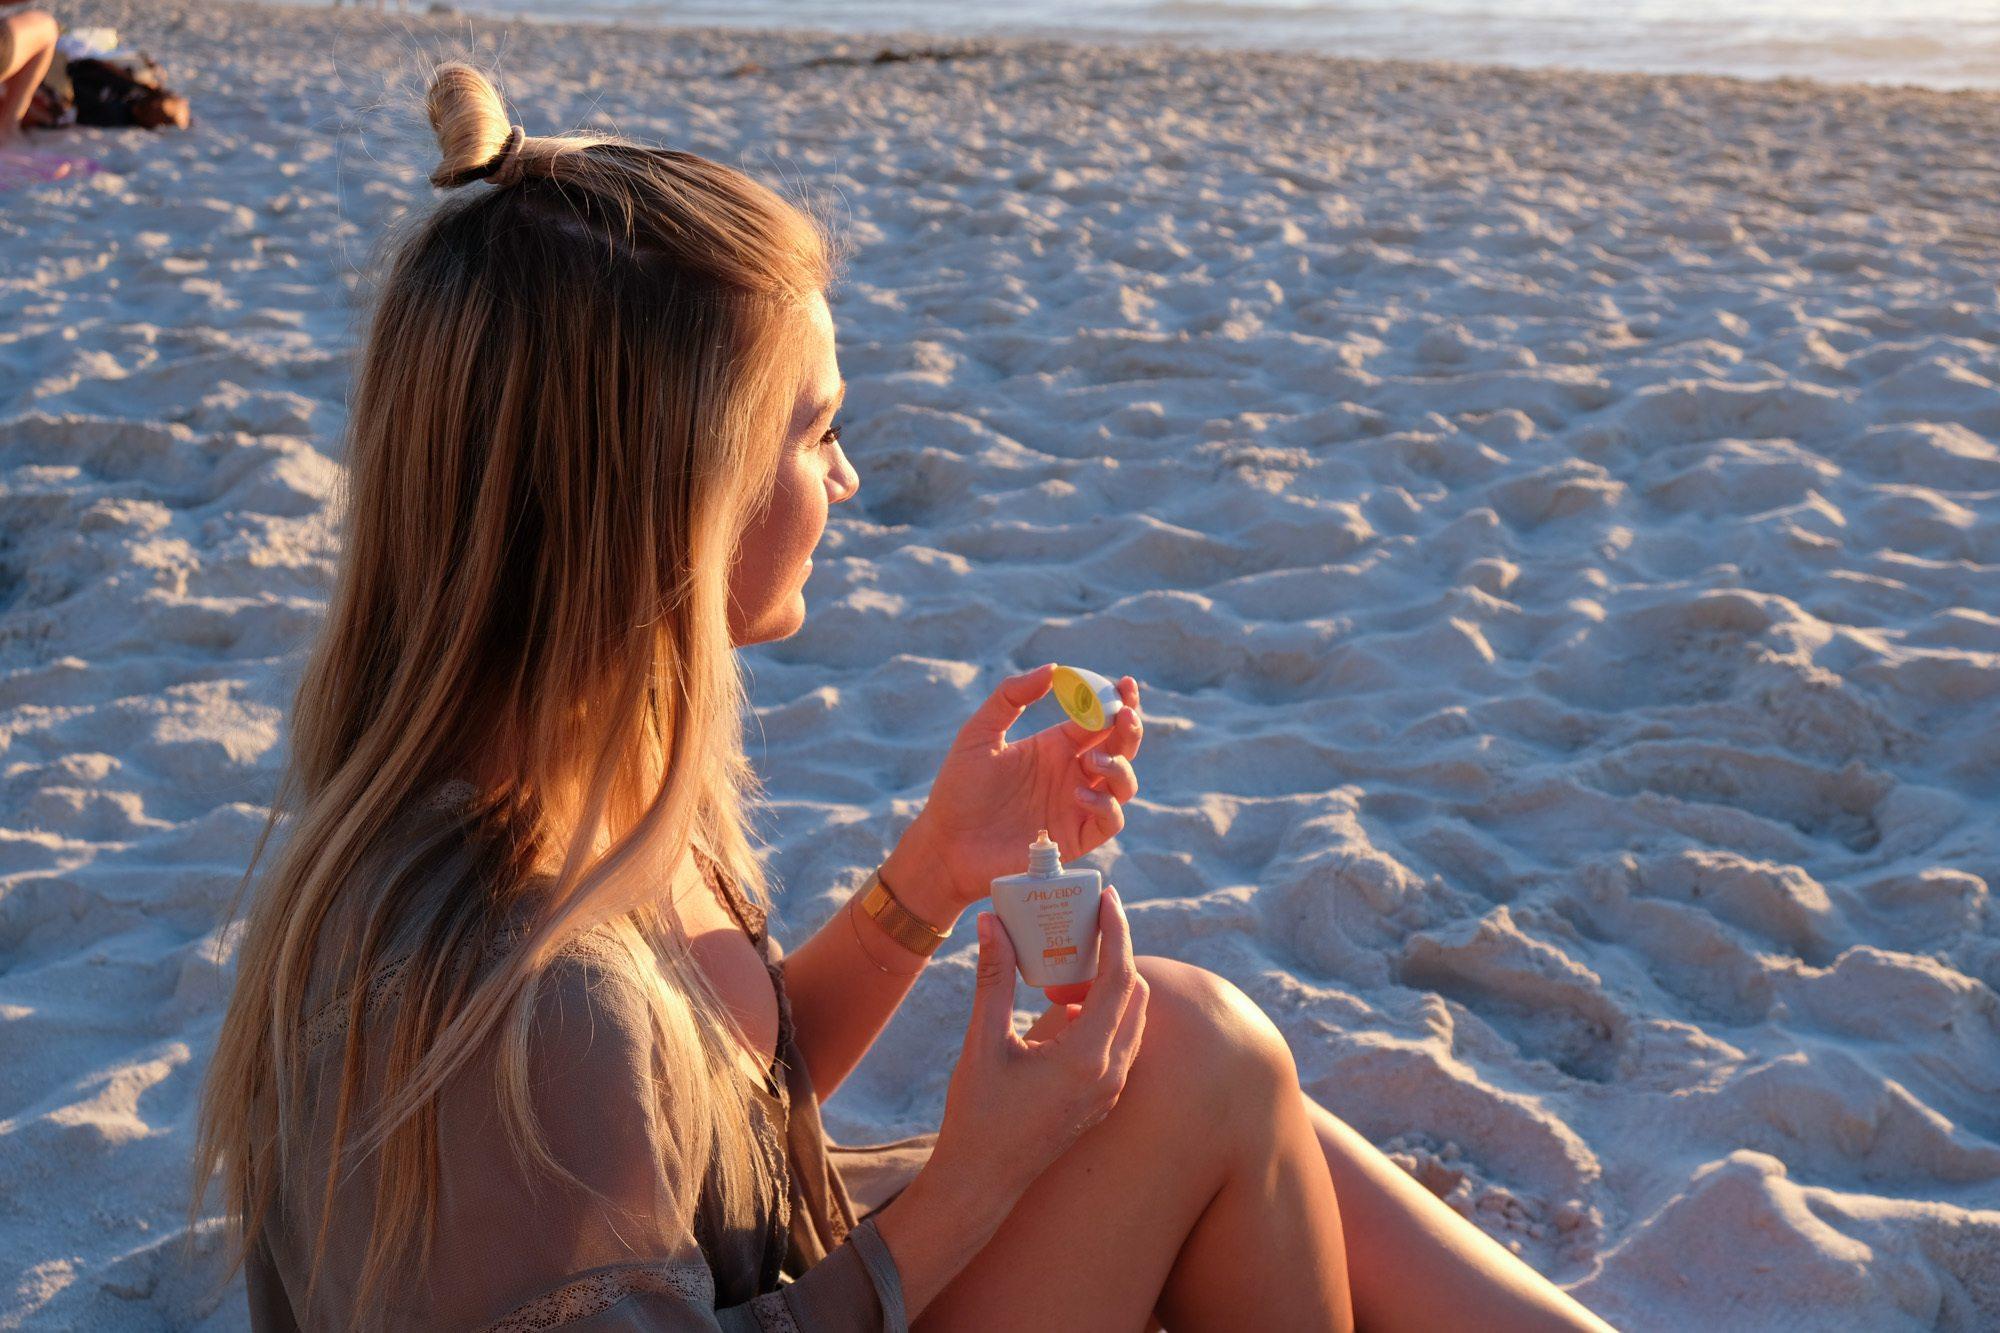 BB Cream with Sunscreen